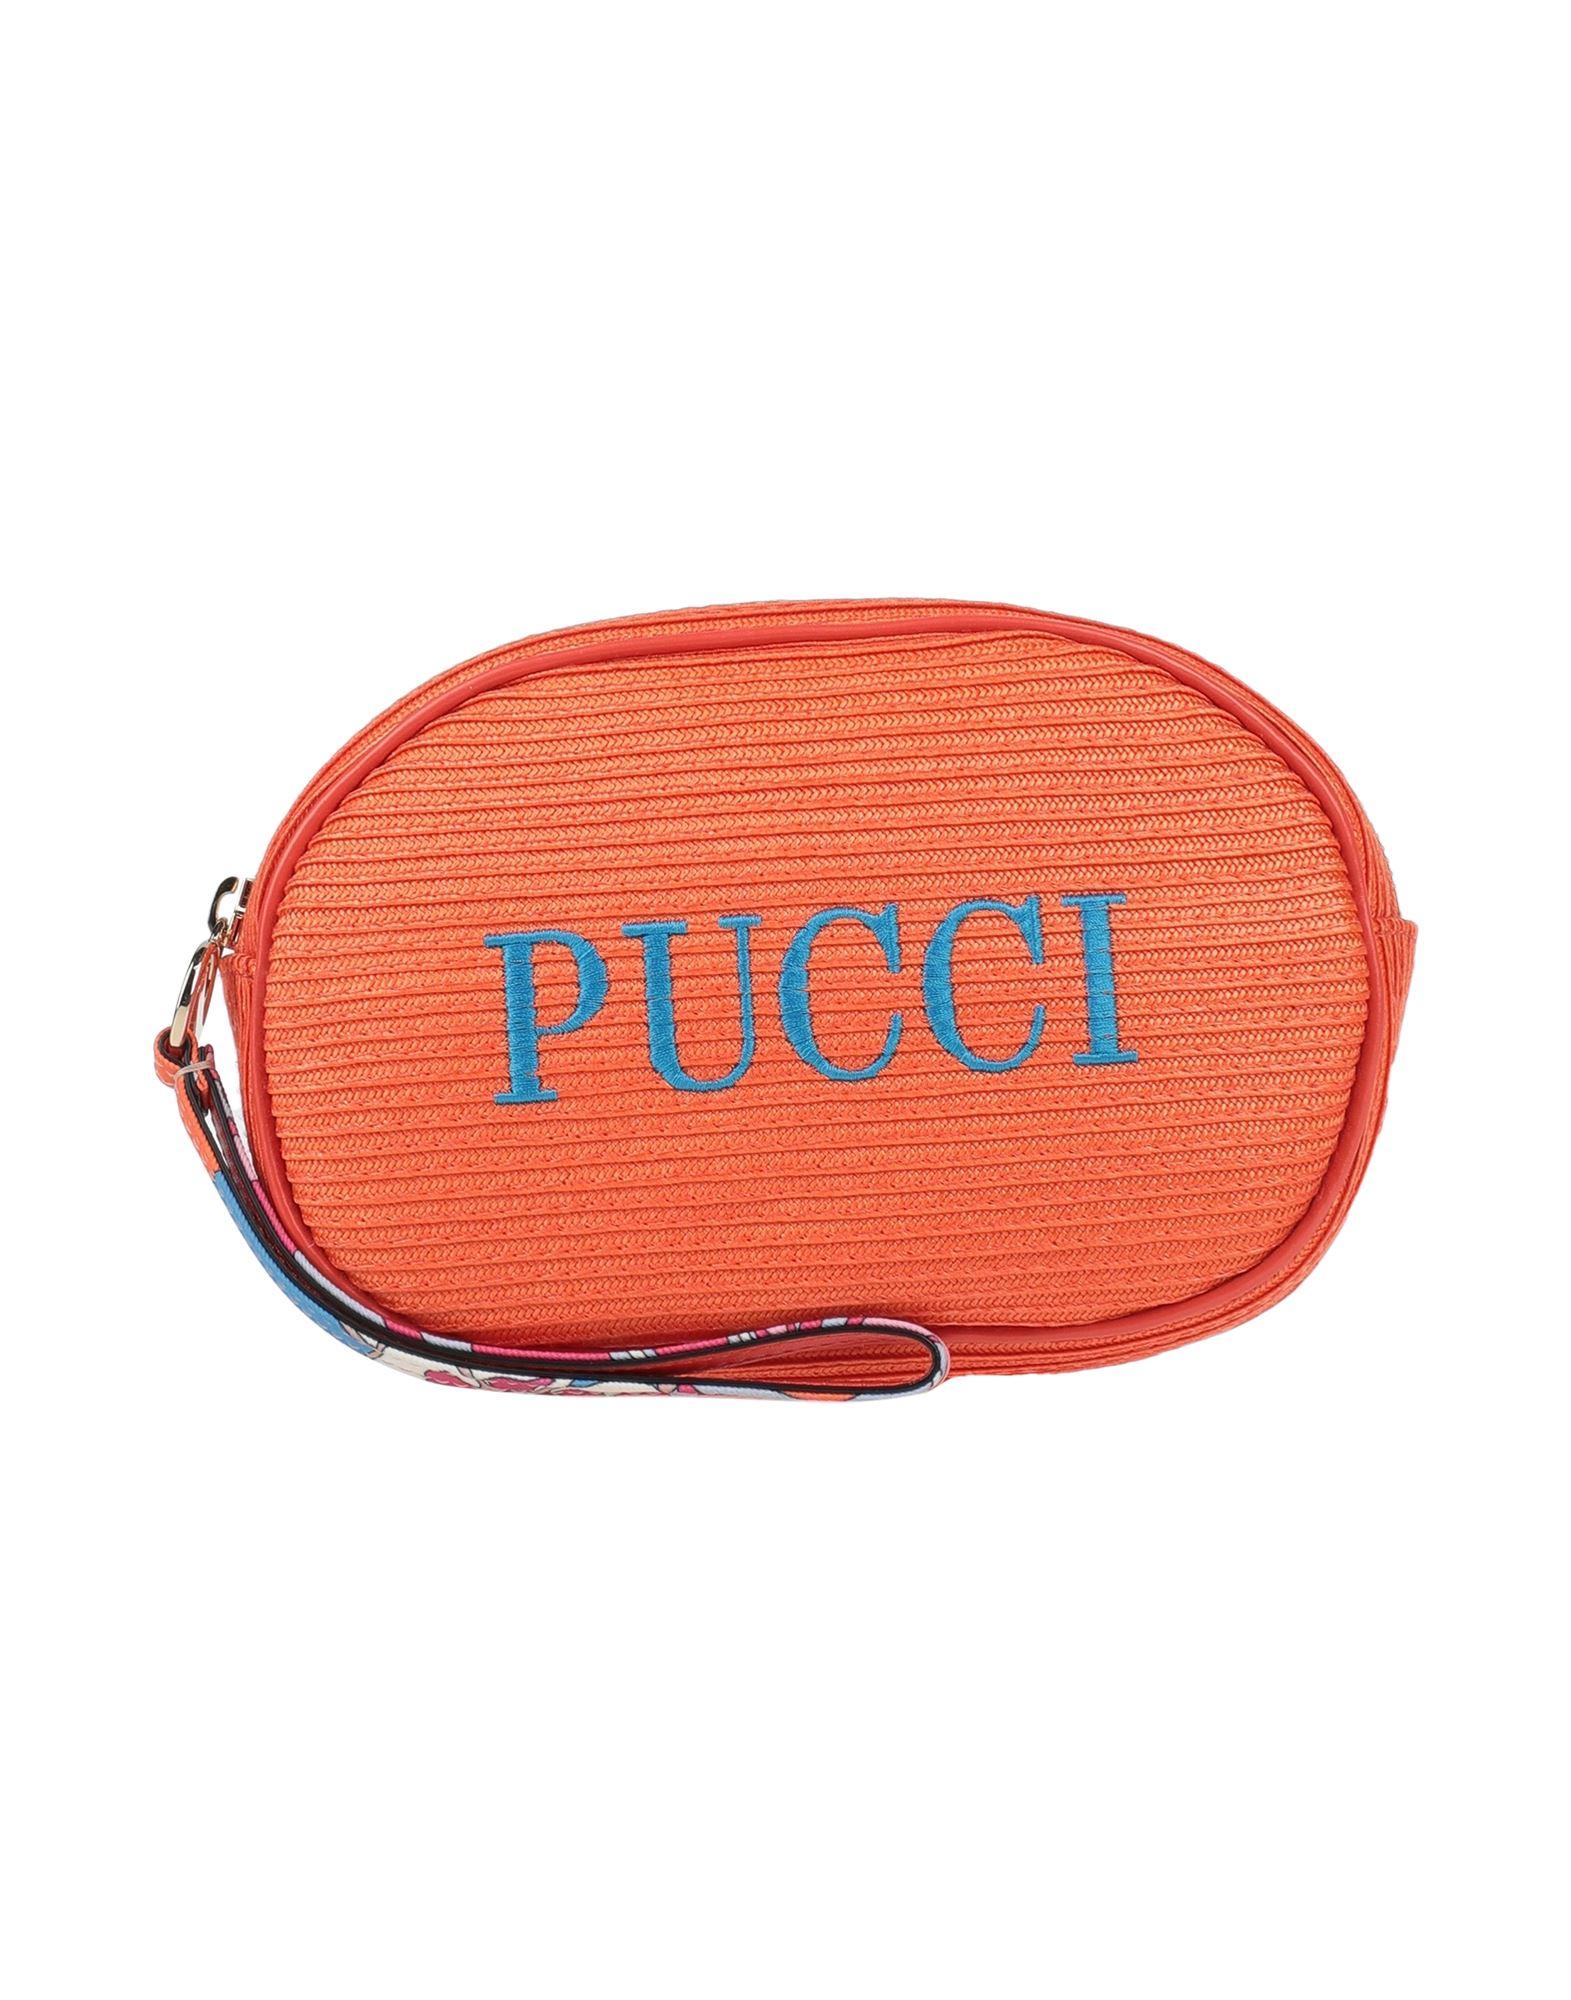 EMILIO PUCCI Beauty case emilio pucci beauty case